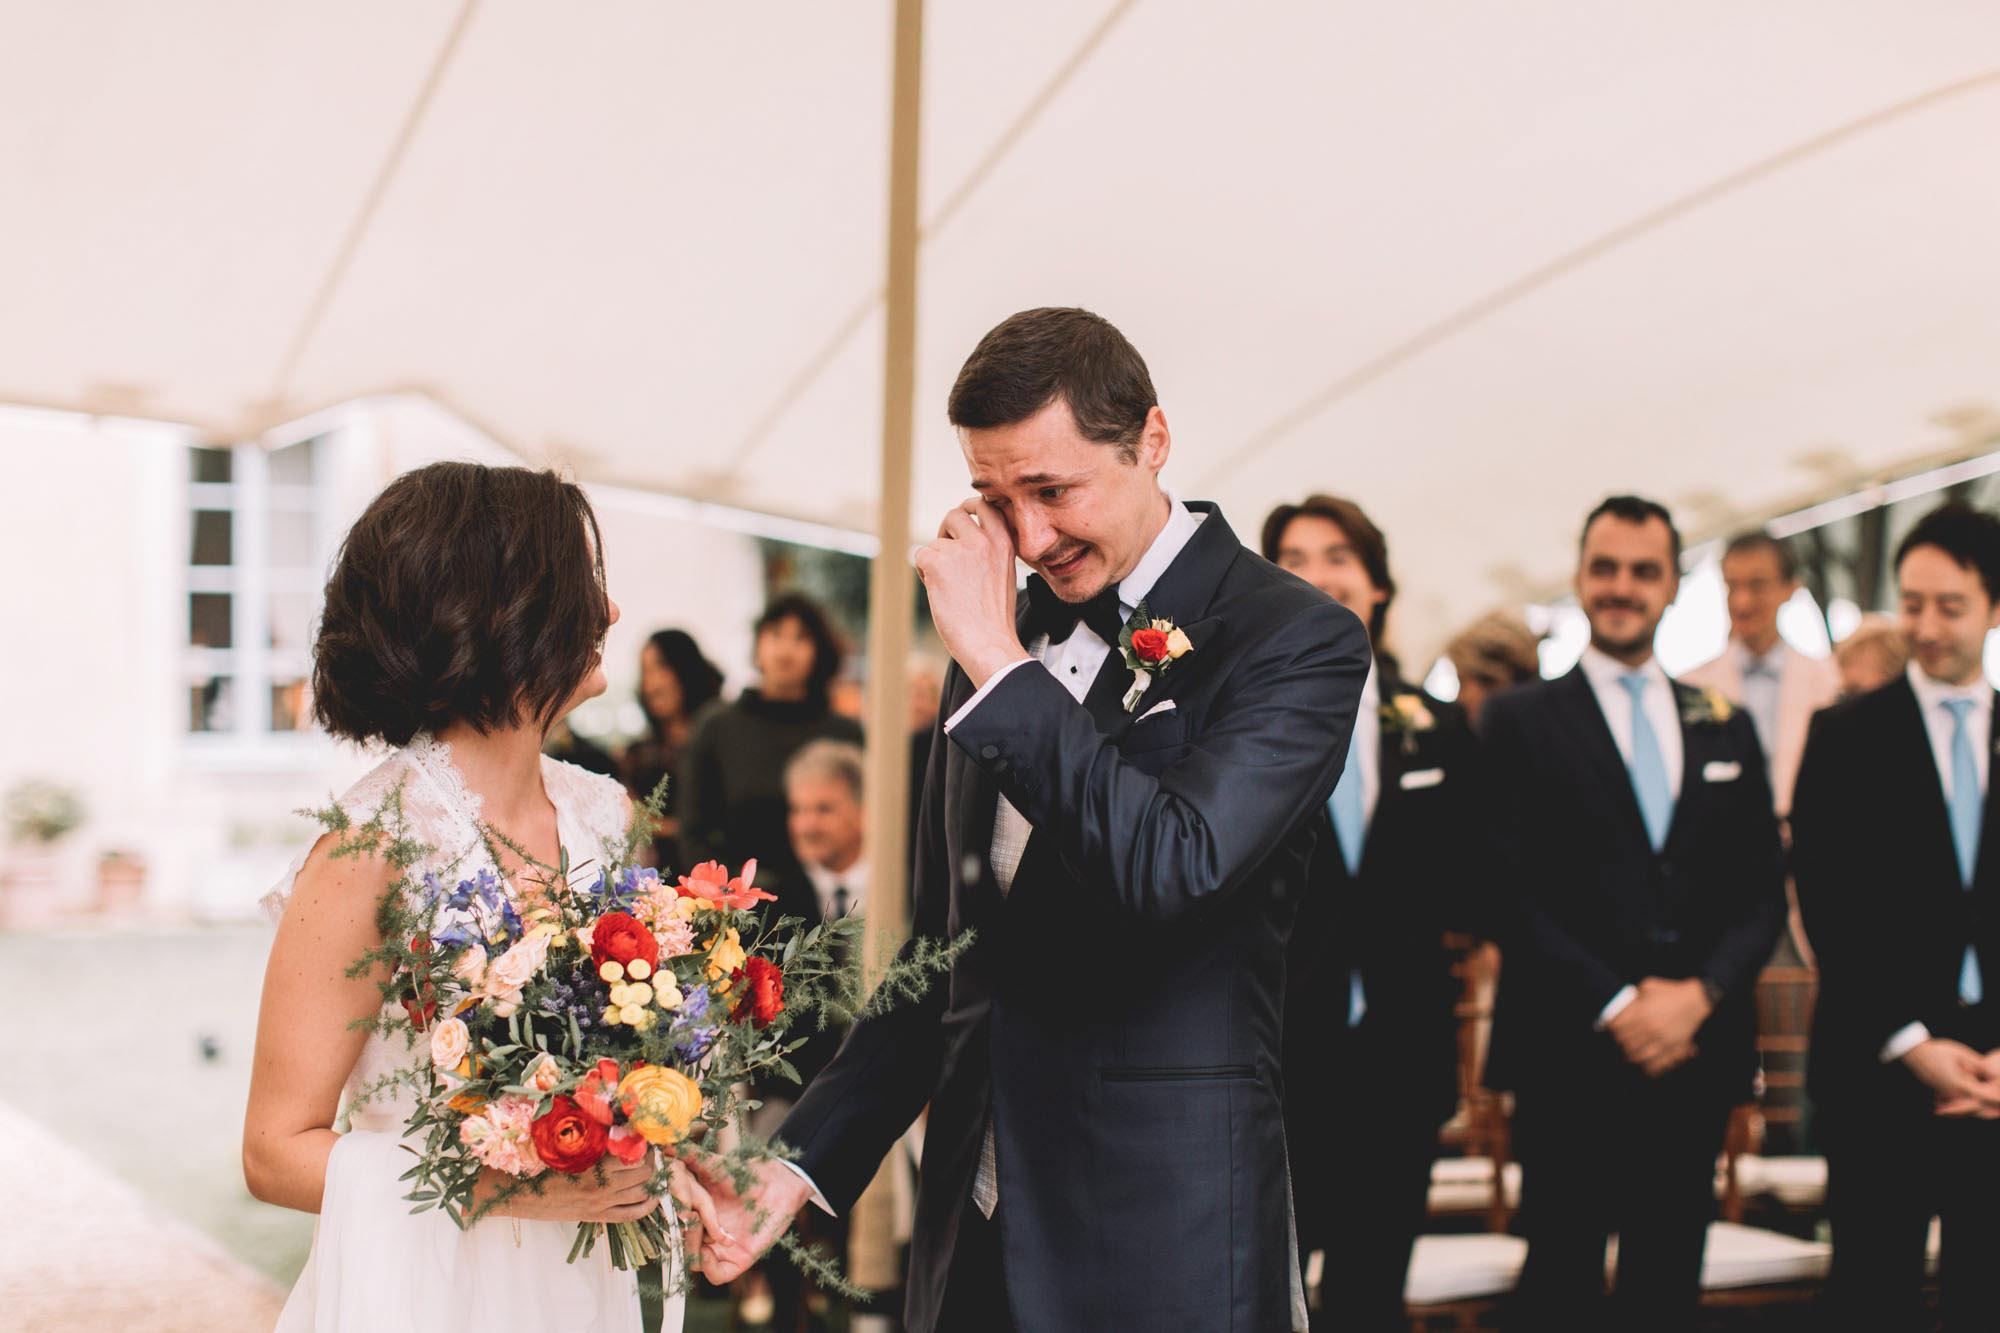 NOEMIE + CATALIN_CHATEAU TALAUD_PHOTOGRAPHE MARIAGE_LES BANDITS-1